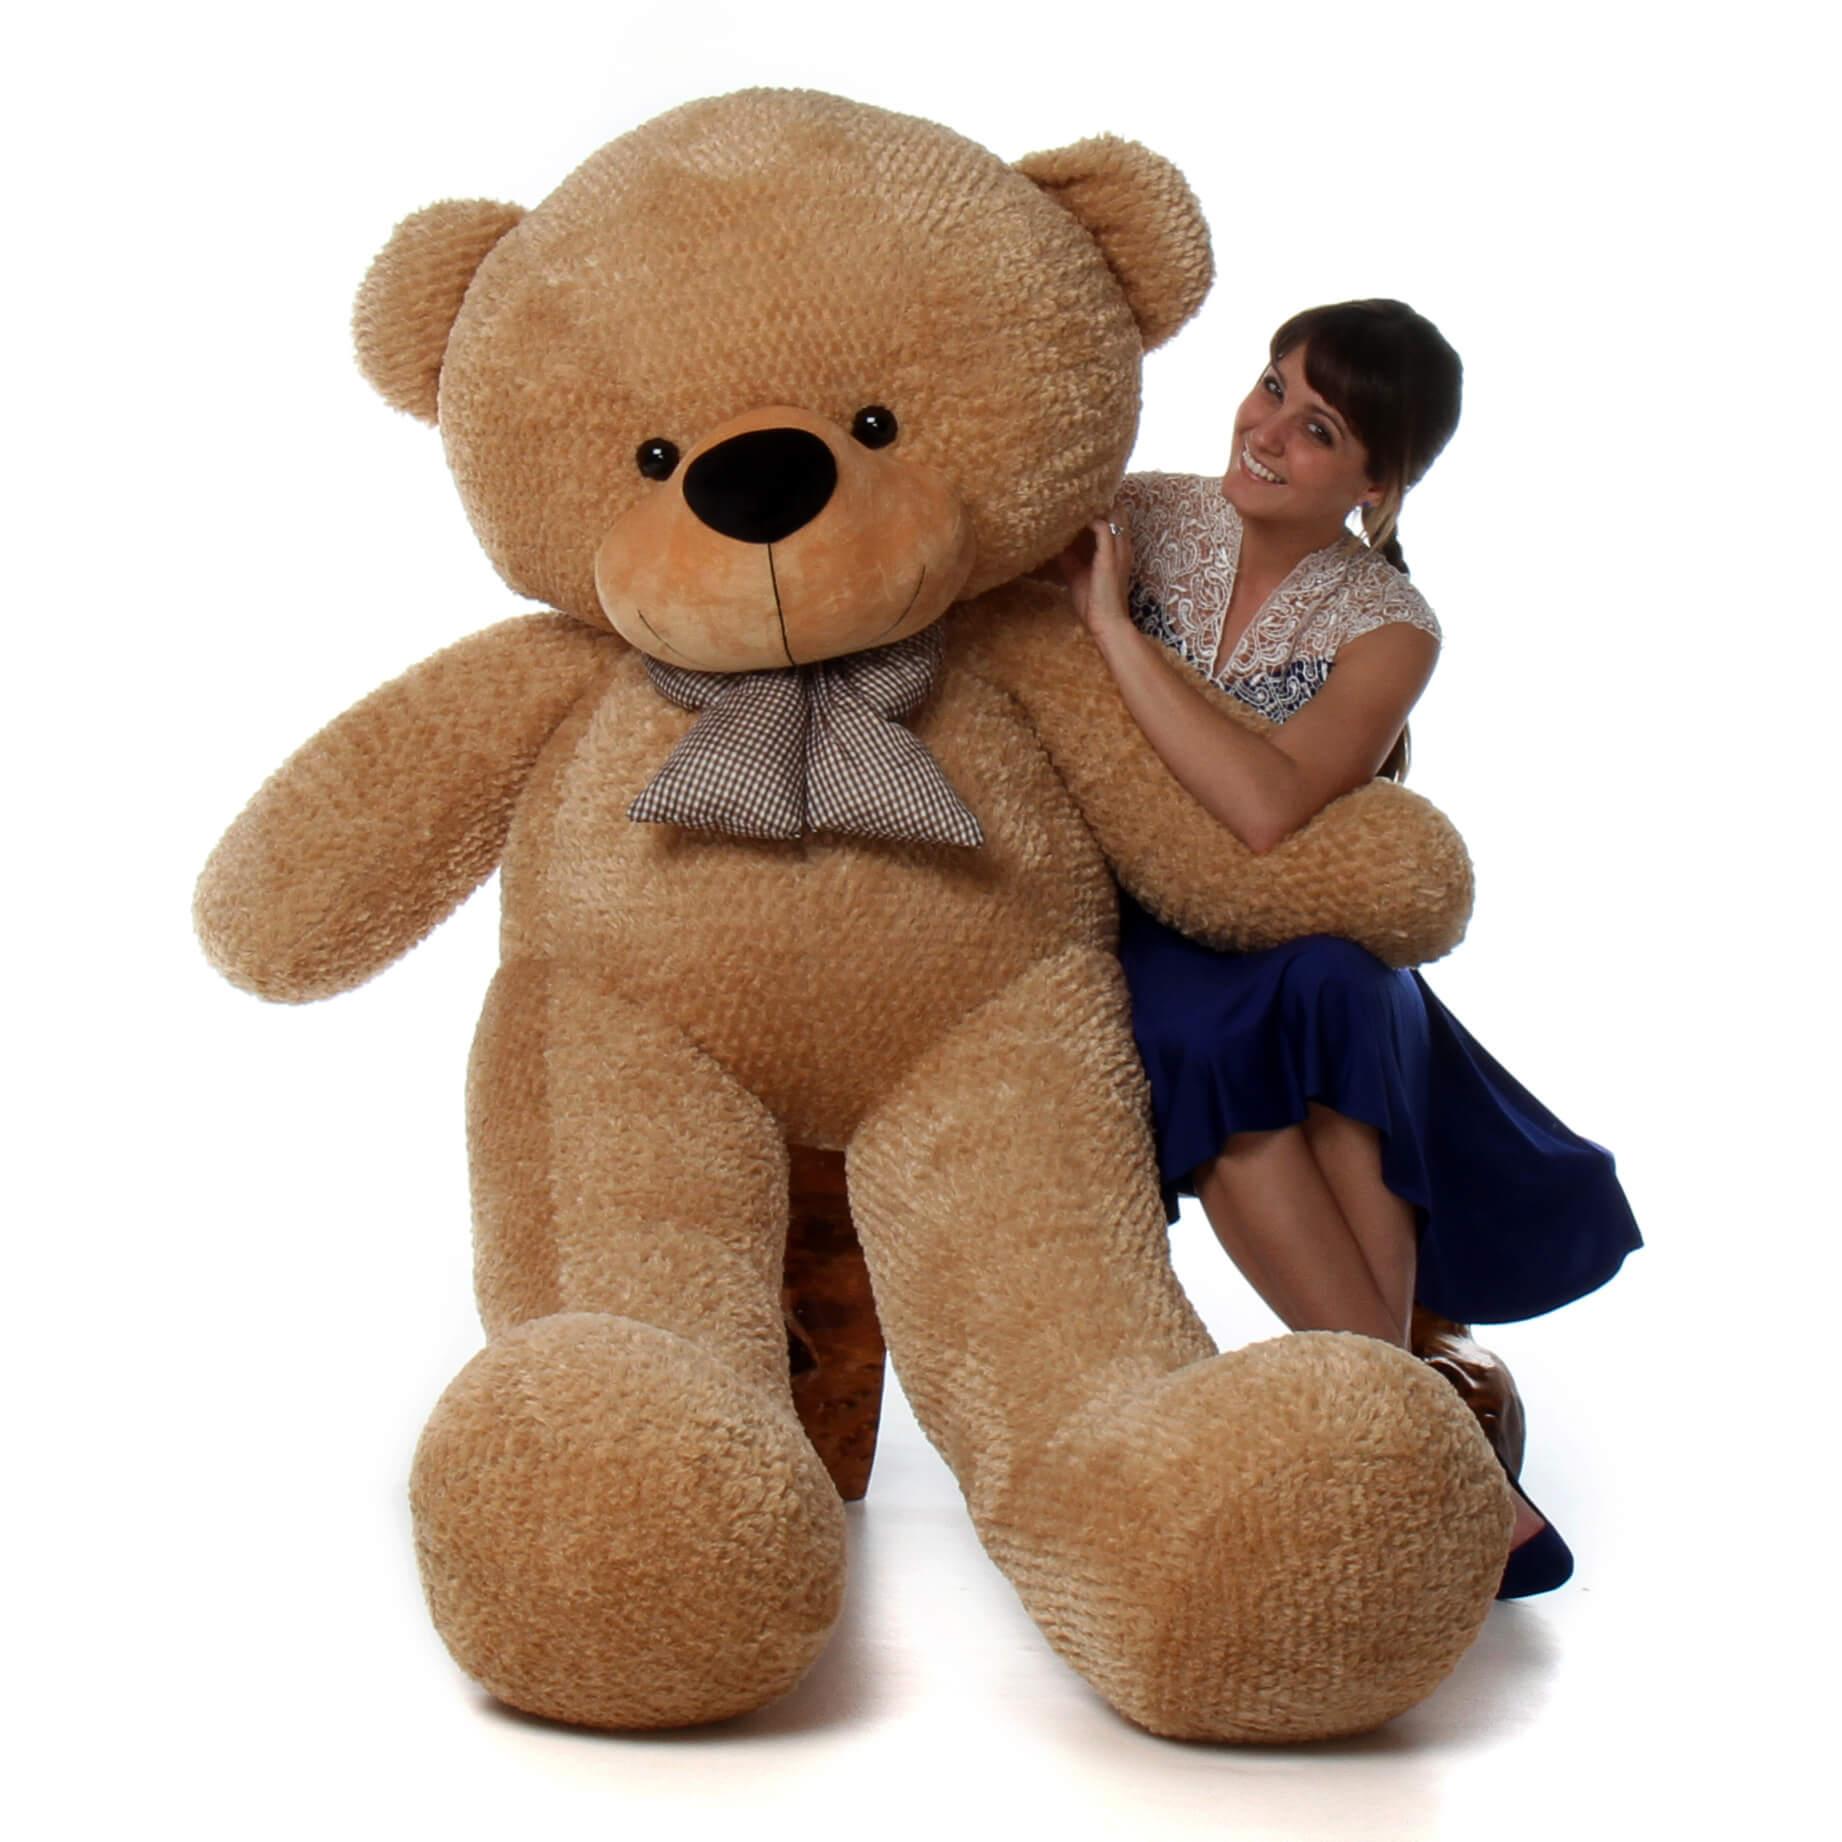 6ft-life-size-amazing-brown-teddy-bear-shaggy-cuddles-a-.jpg